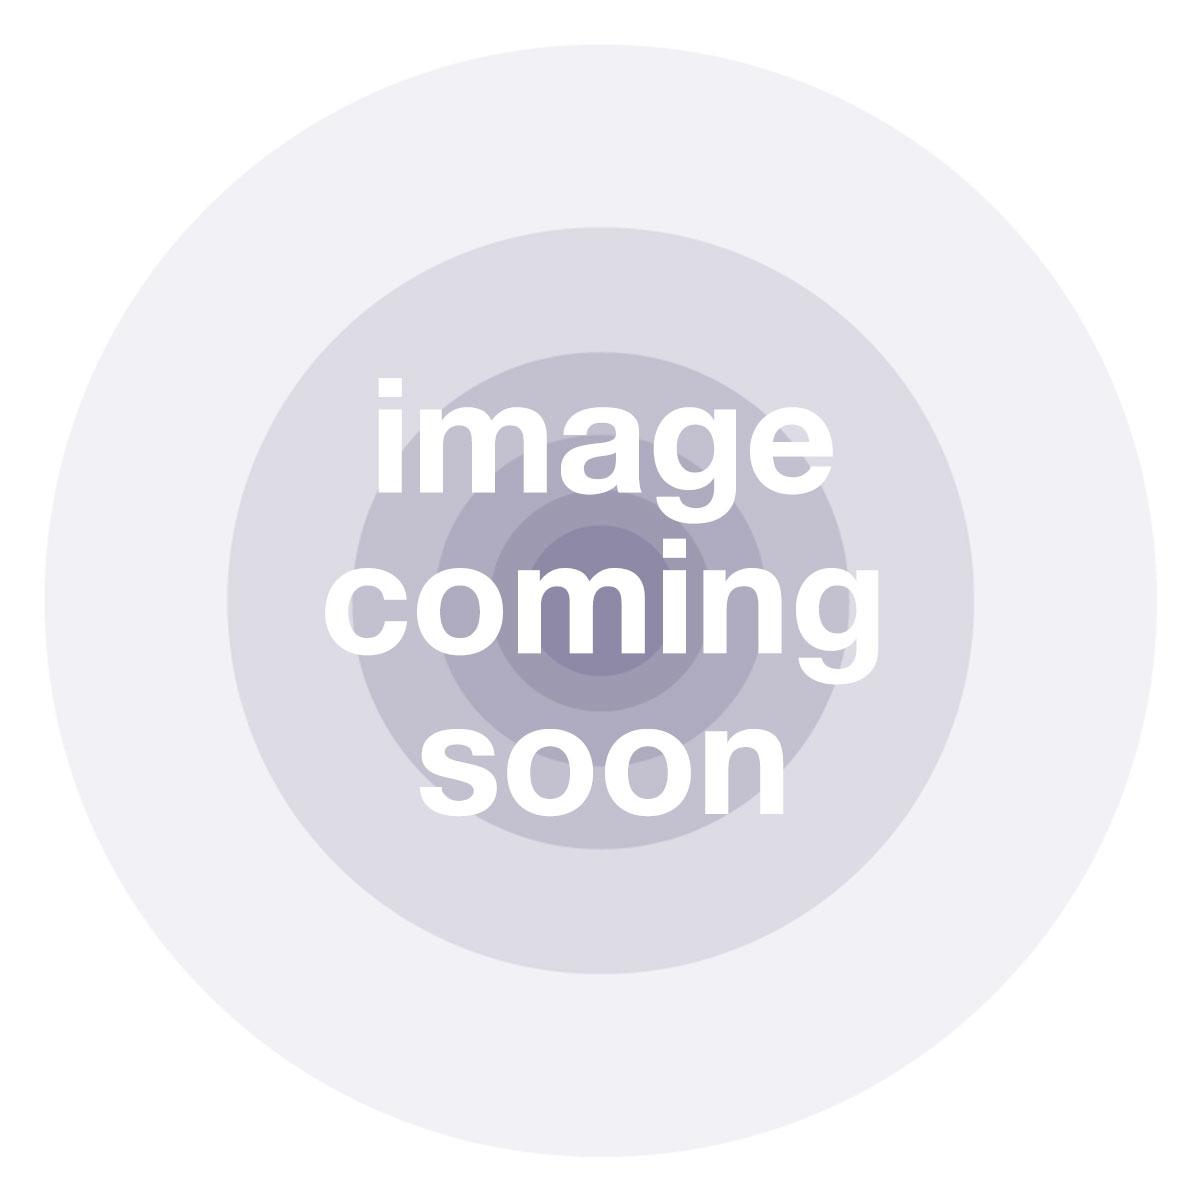 LaCie 8big Rack Thunderbolt 2 Hard Drive 64TB Enterprise Class